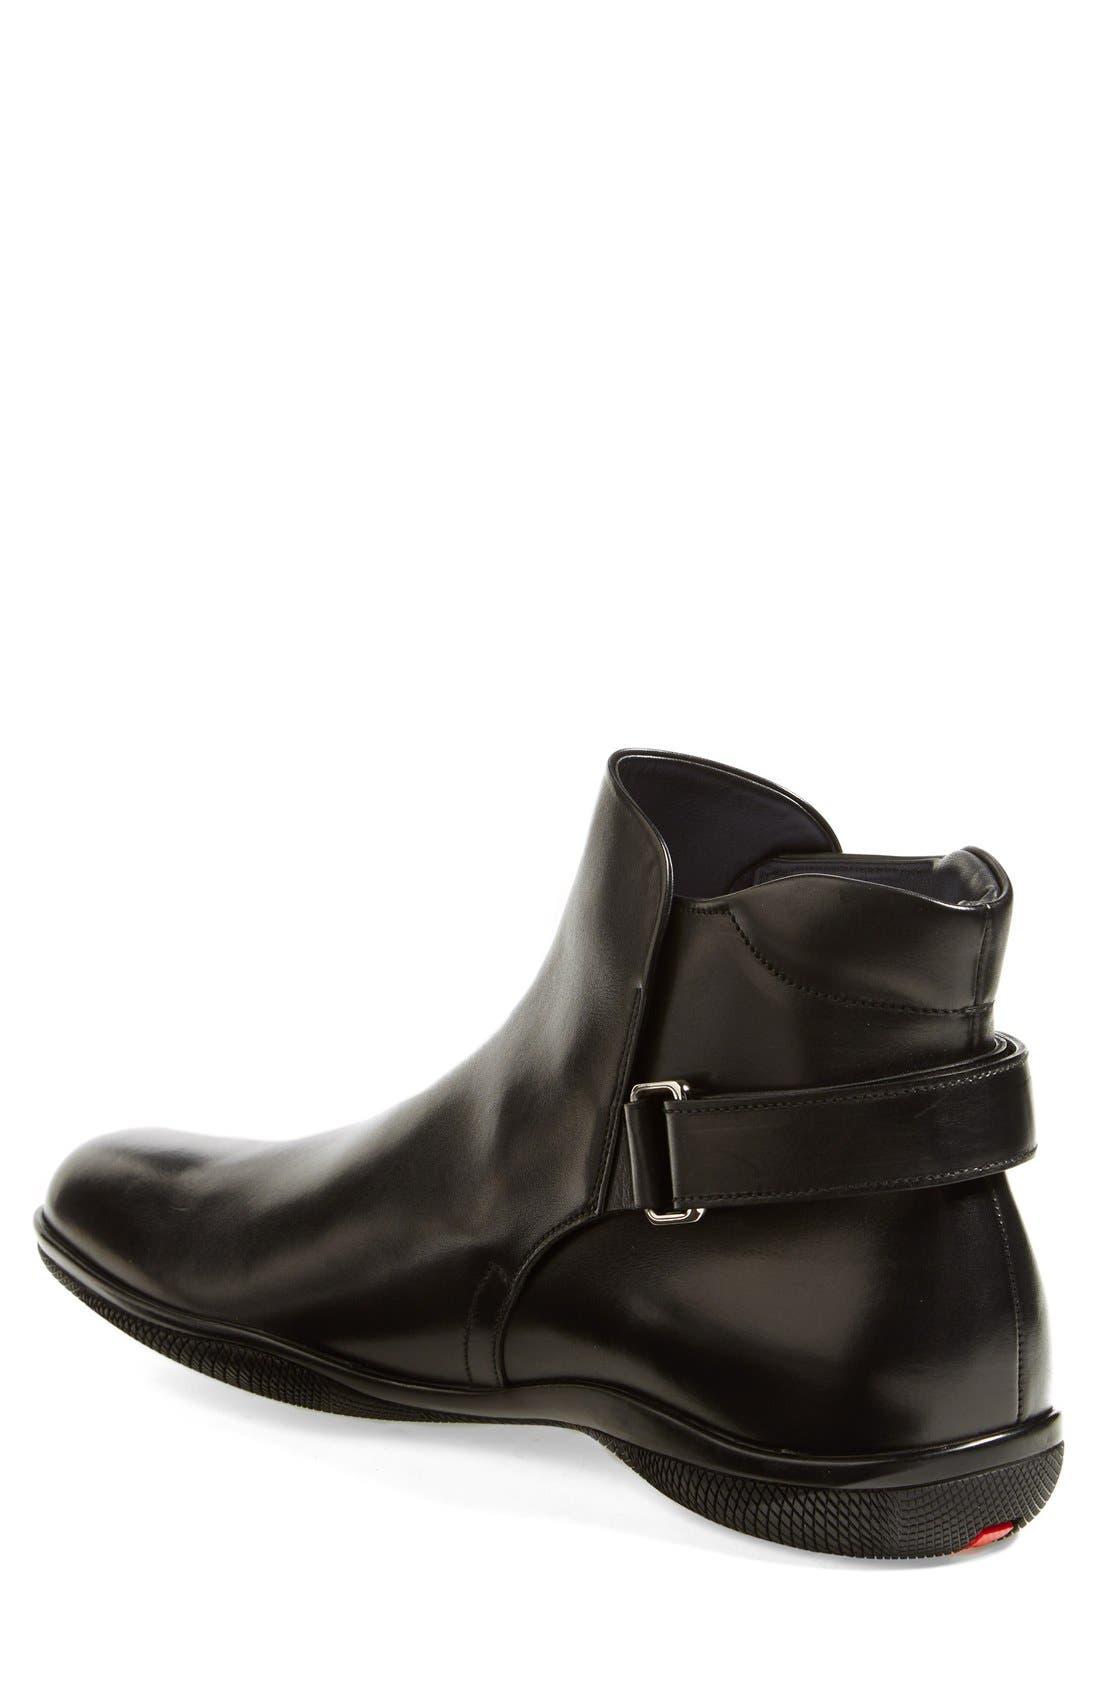 Alternate Image 2  - Prada 'Toblak' Plain Toe Boot (Men)